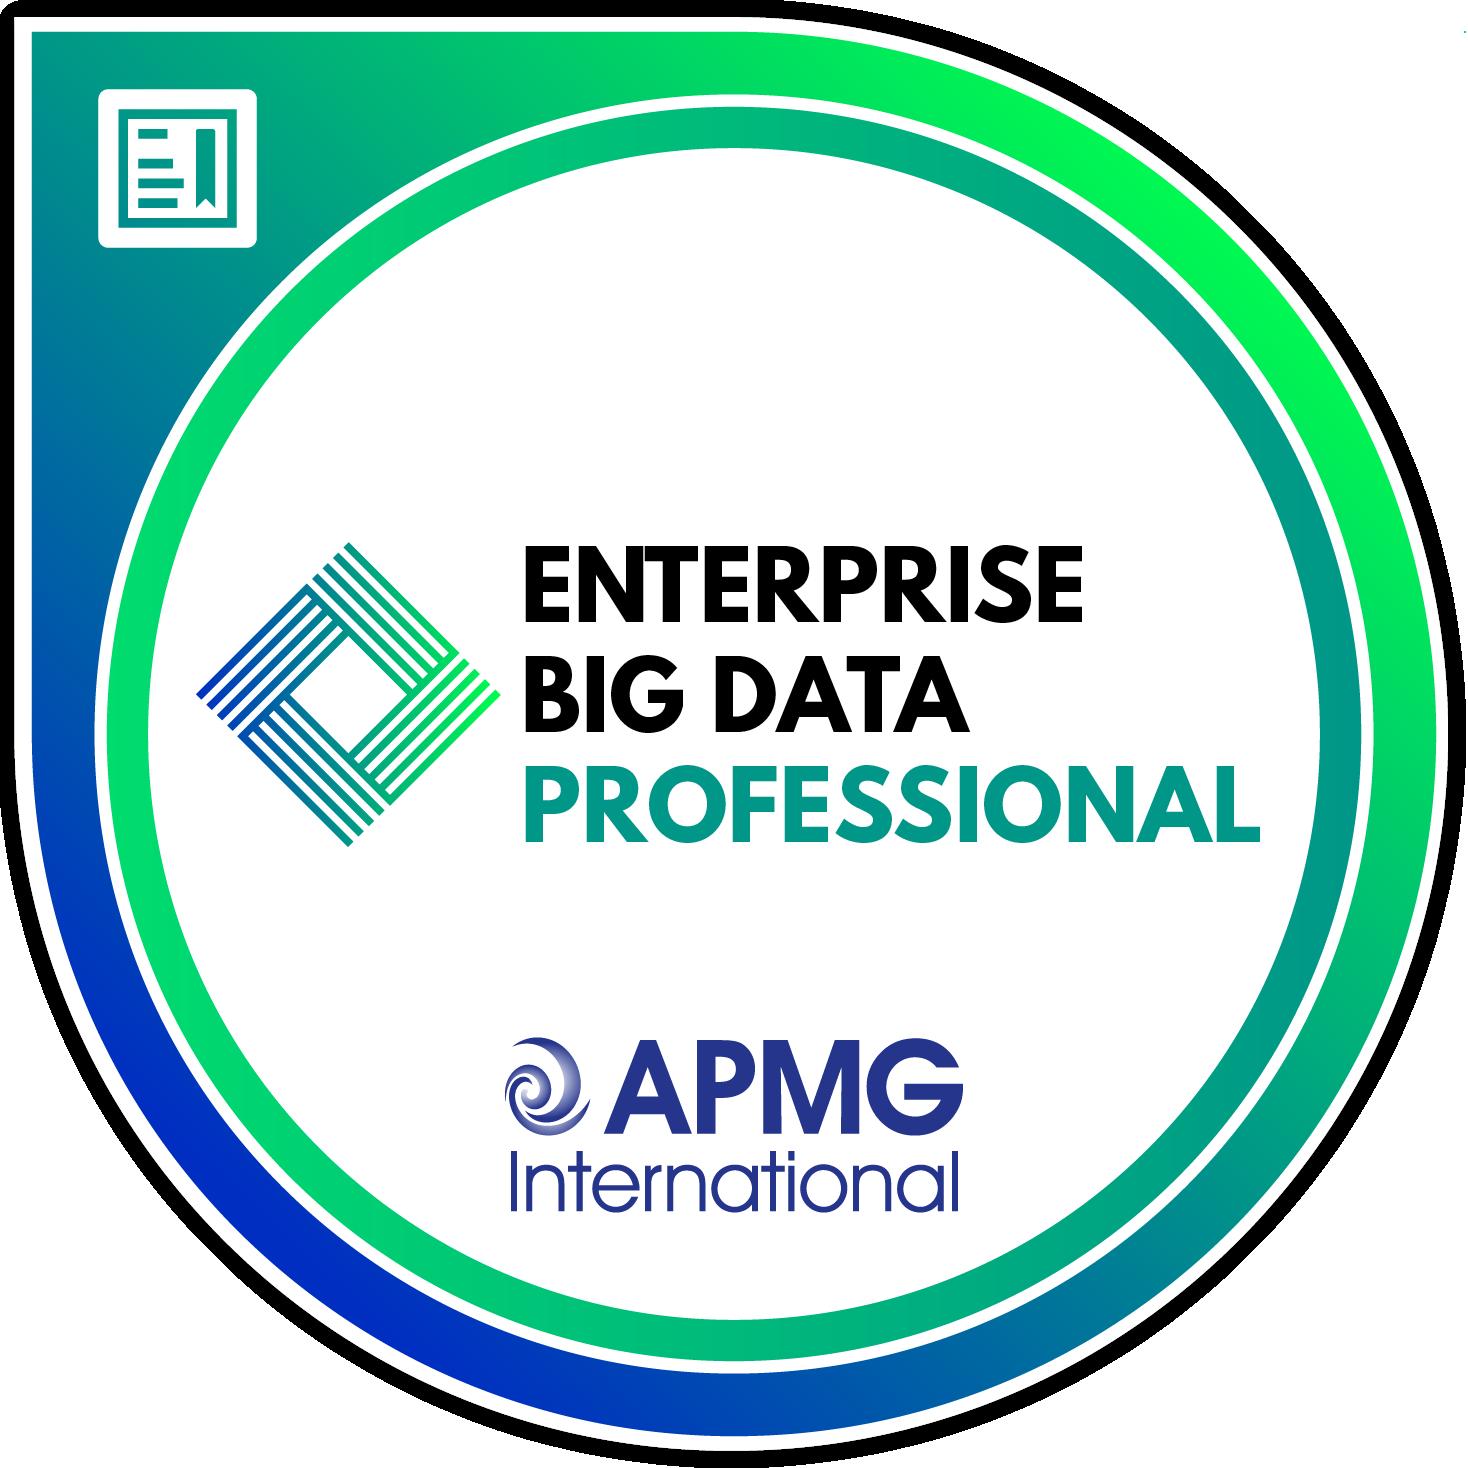 Enterprise Big Data Professional